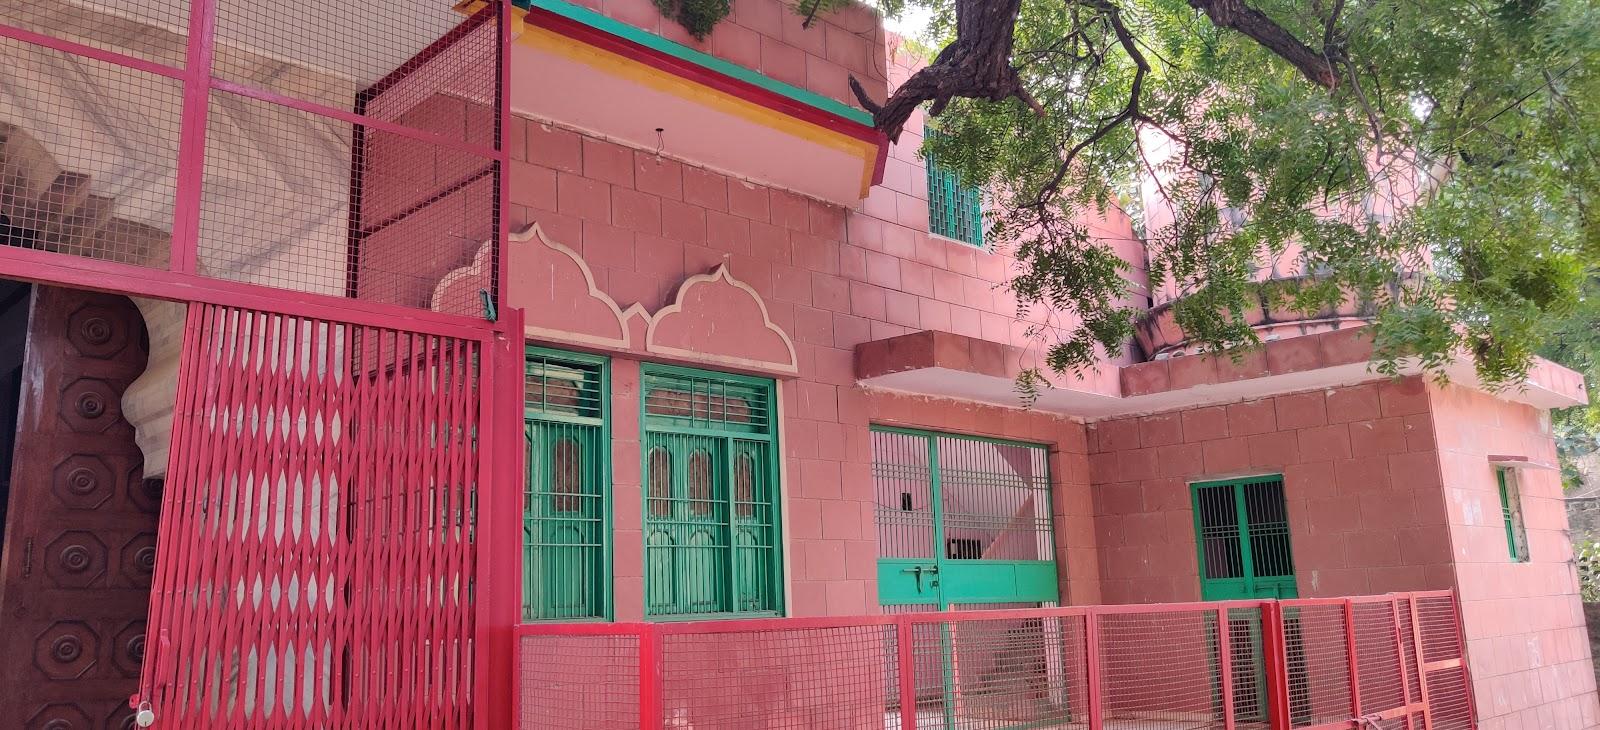 Neeb Karori Baba Temple,Akabarpur Birth place of Baba Neeb Karori